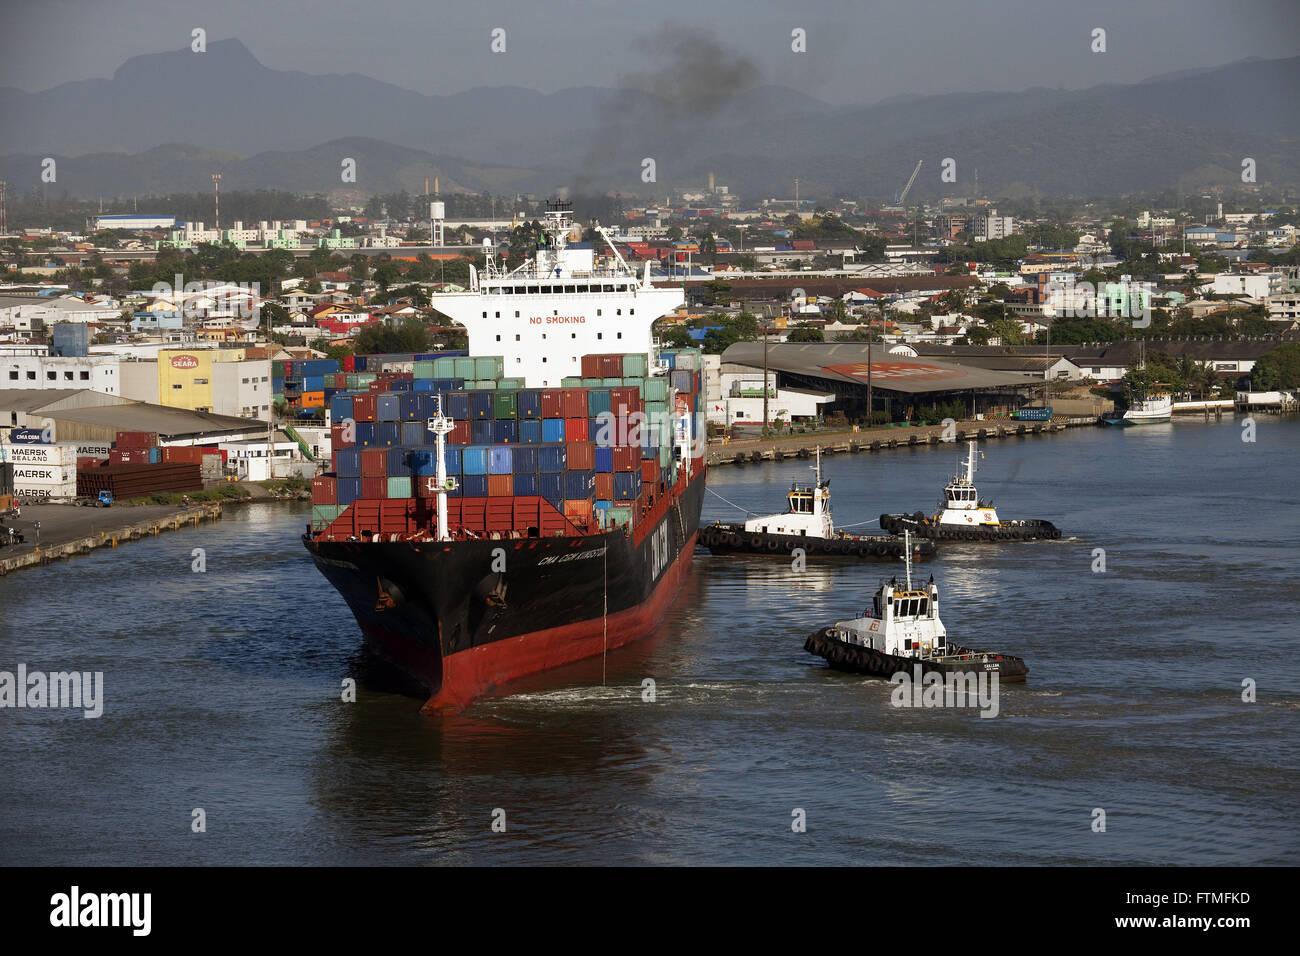 Cargo ship leaving the port of Itajai followed by tugs - Stock Image